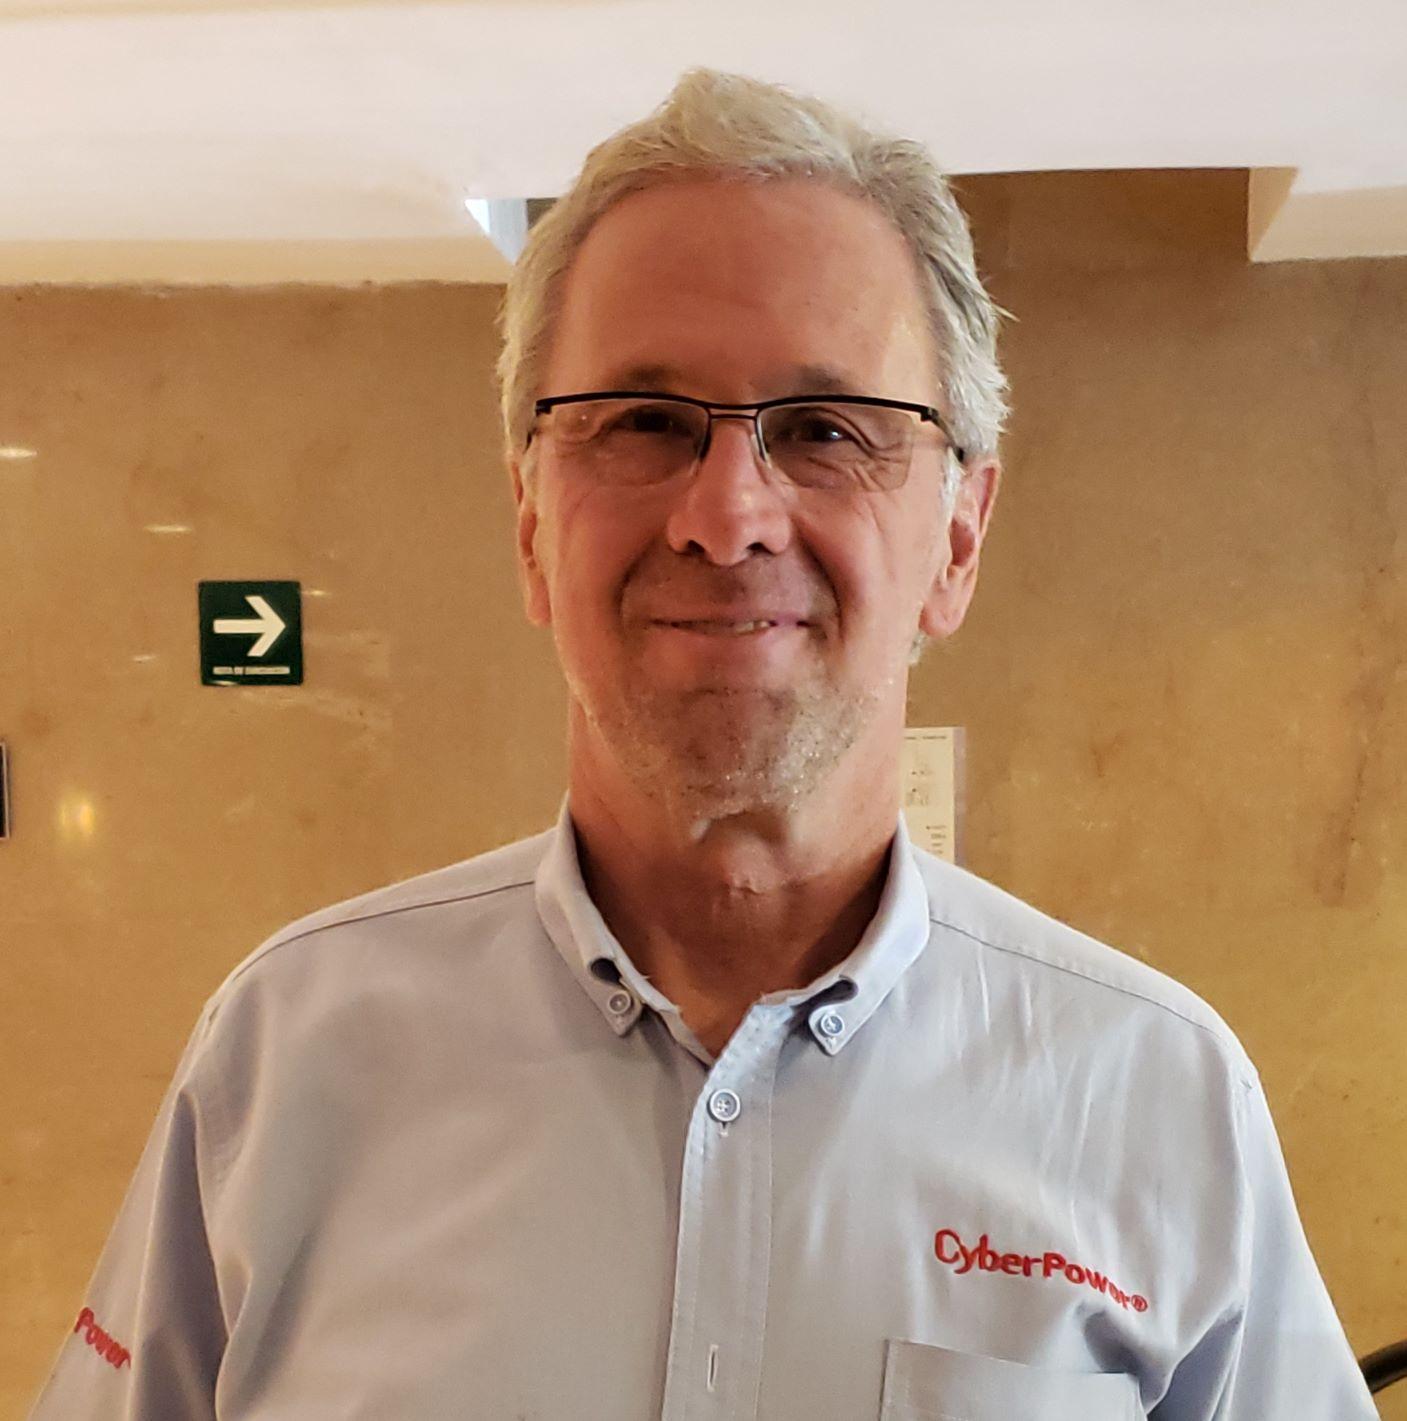 Ricardo Mones